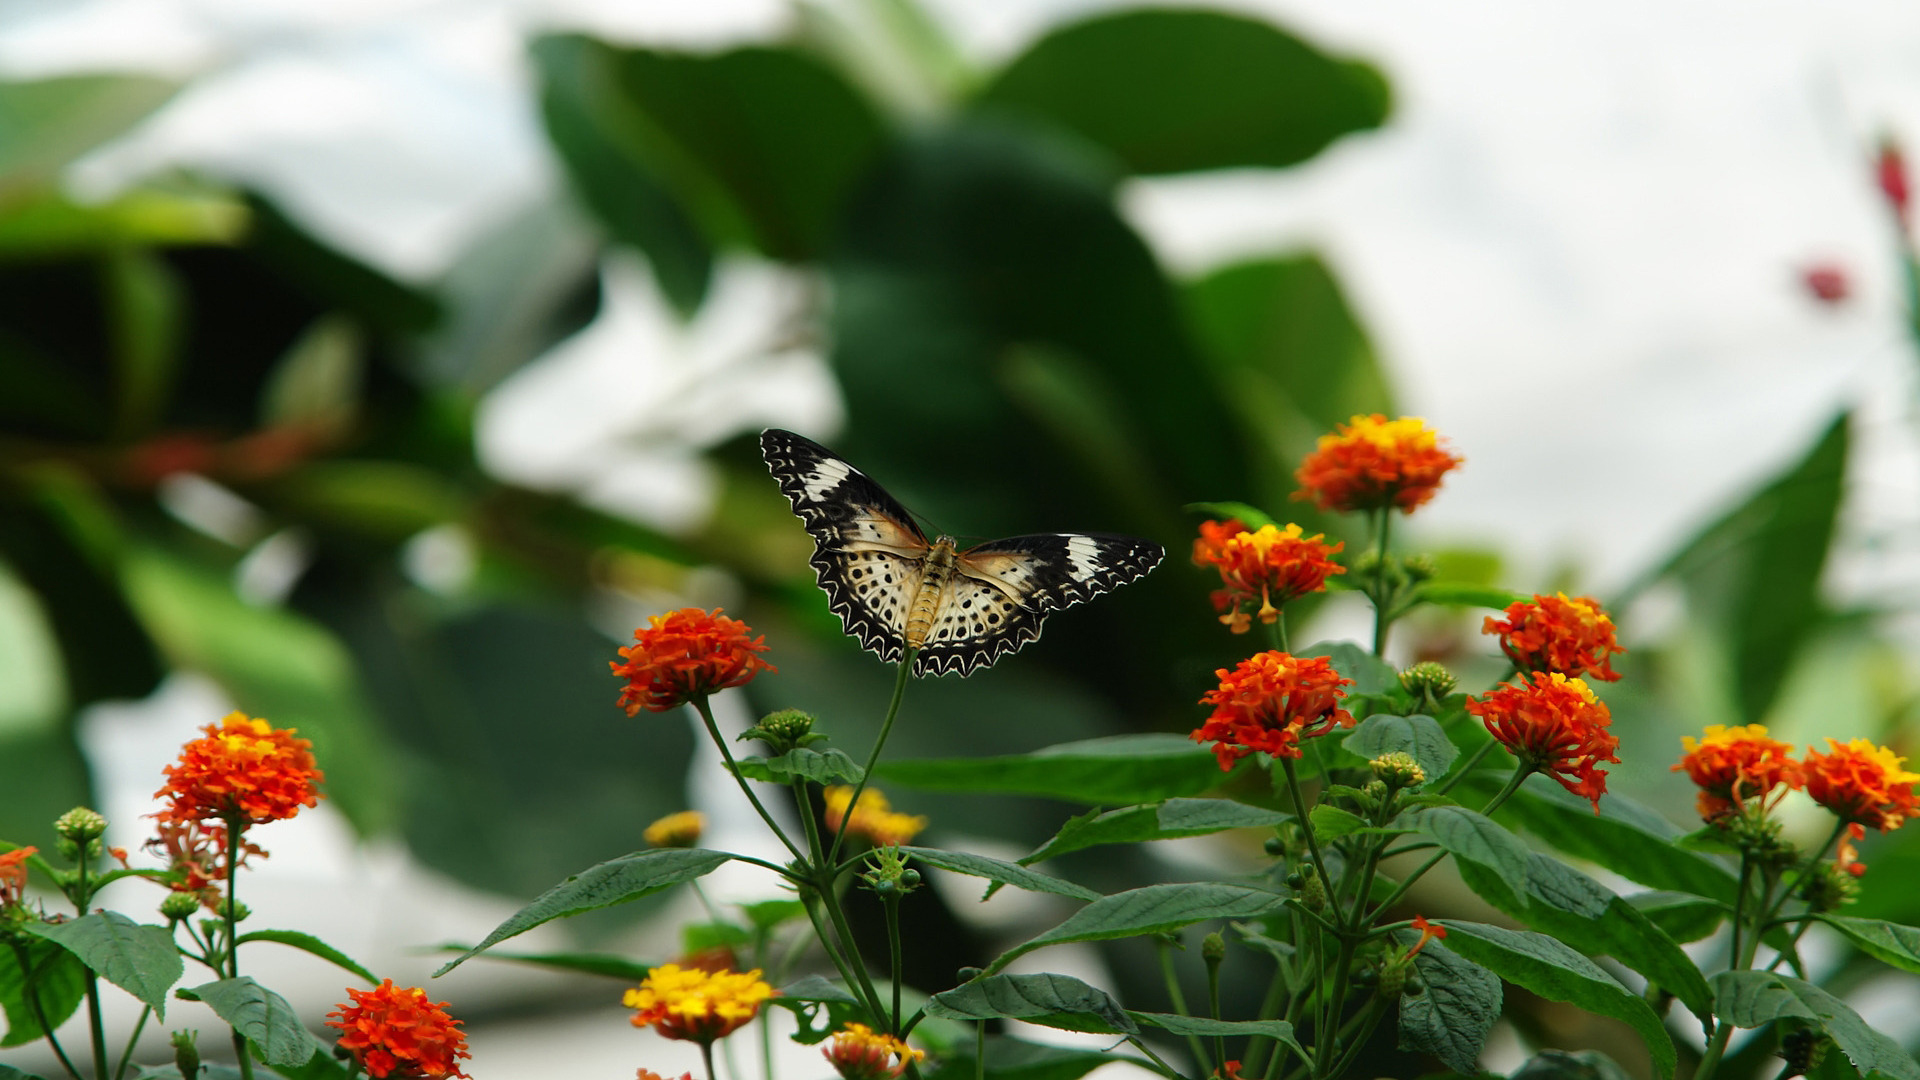 50+ Beautiful Butterfly Wallpapers for Desktop on ...